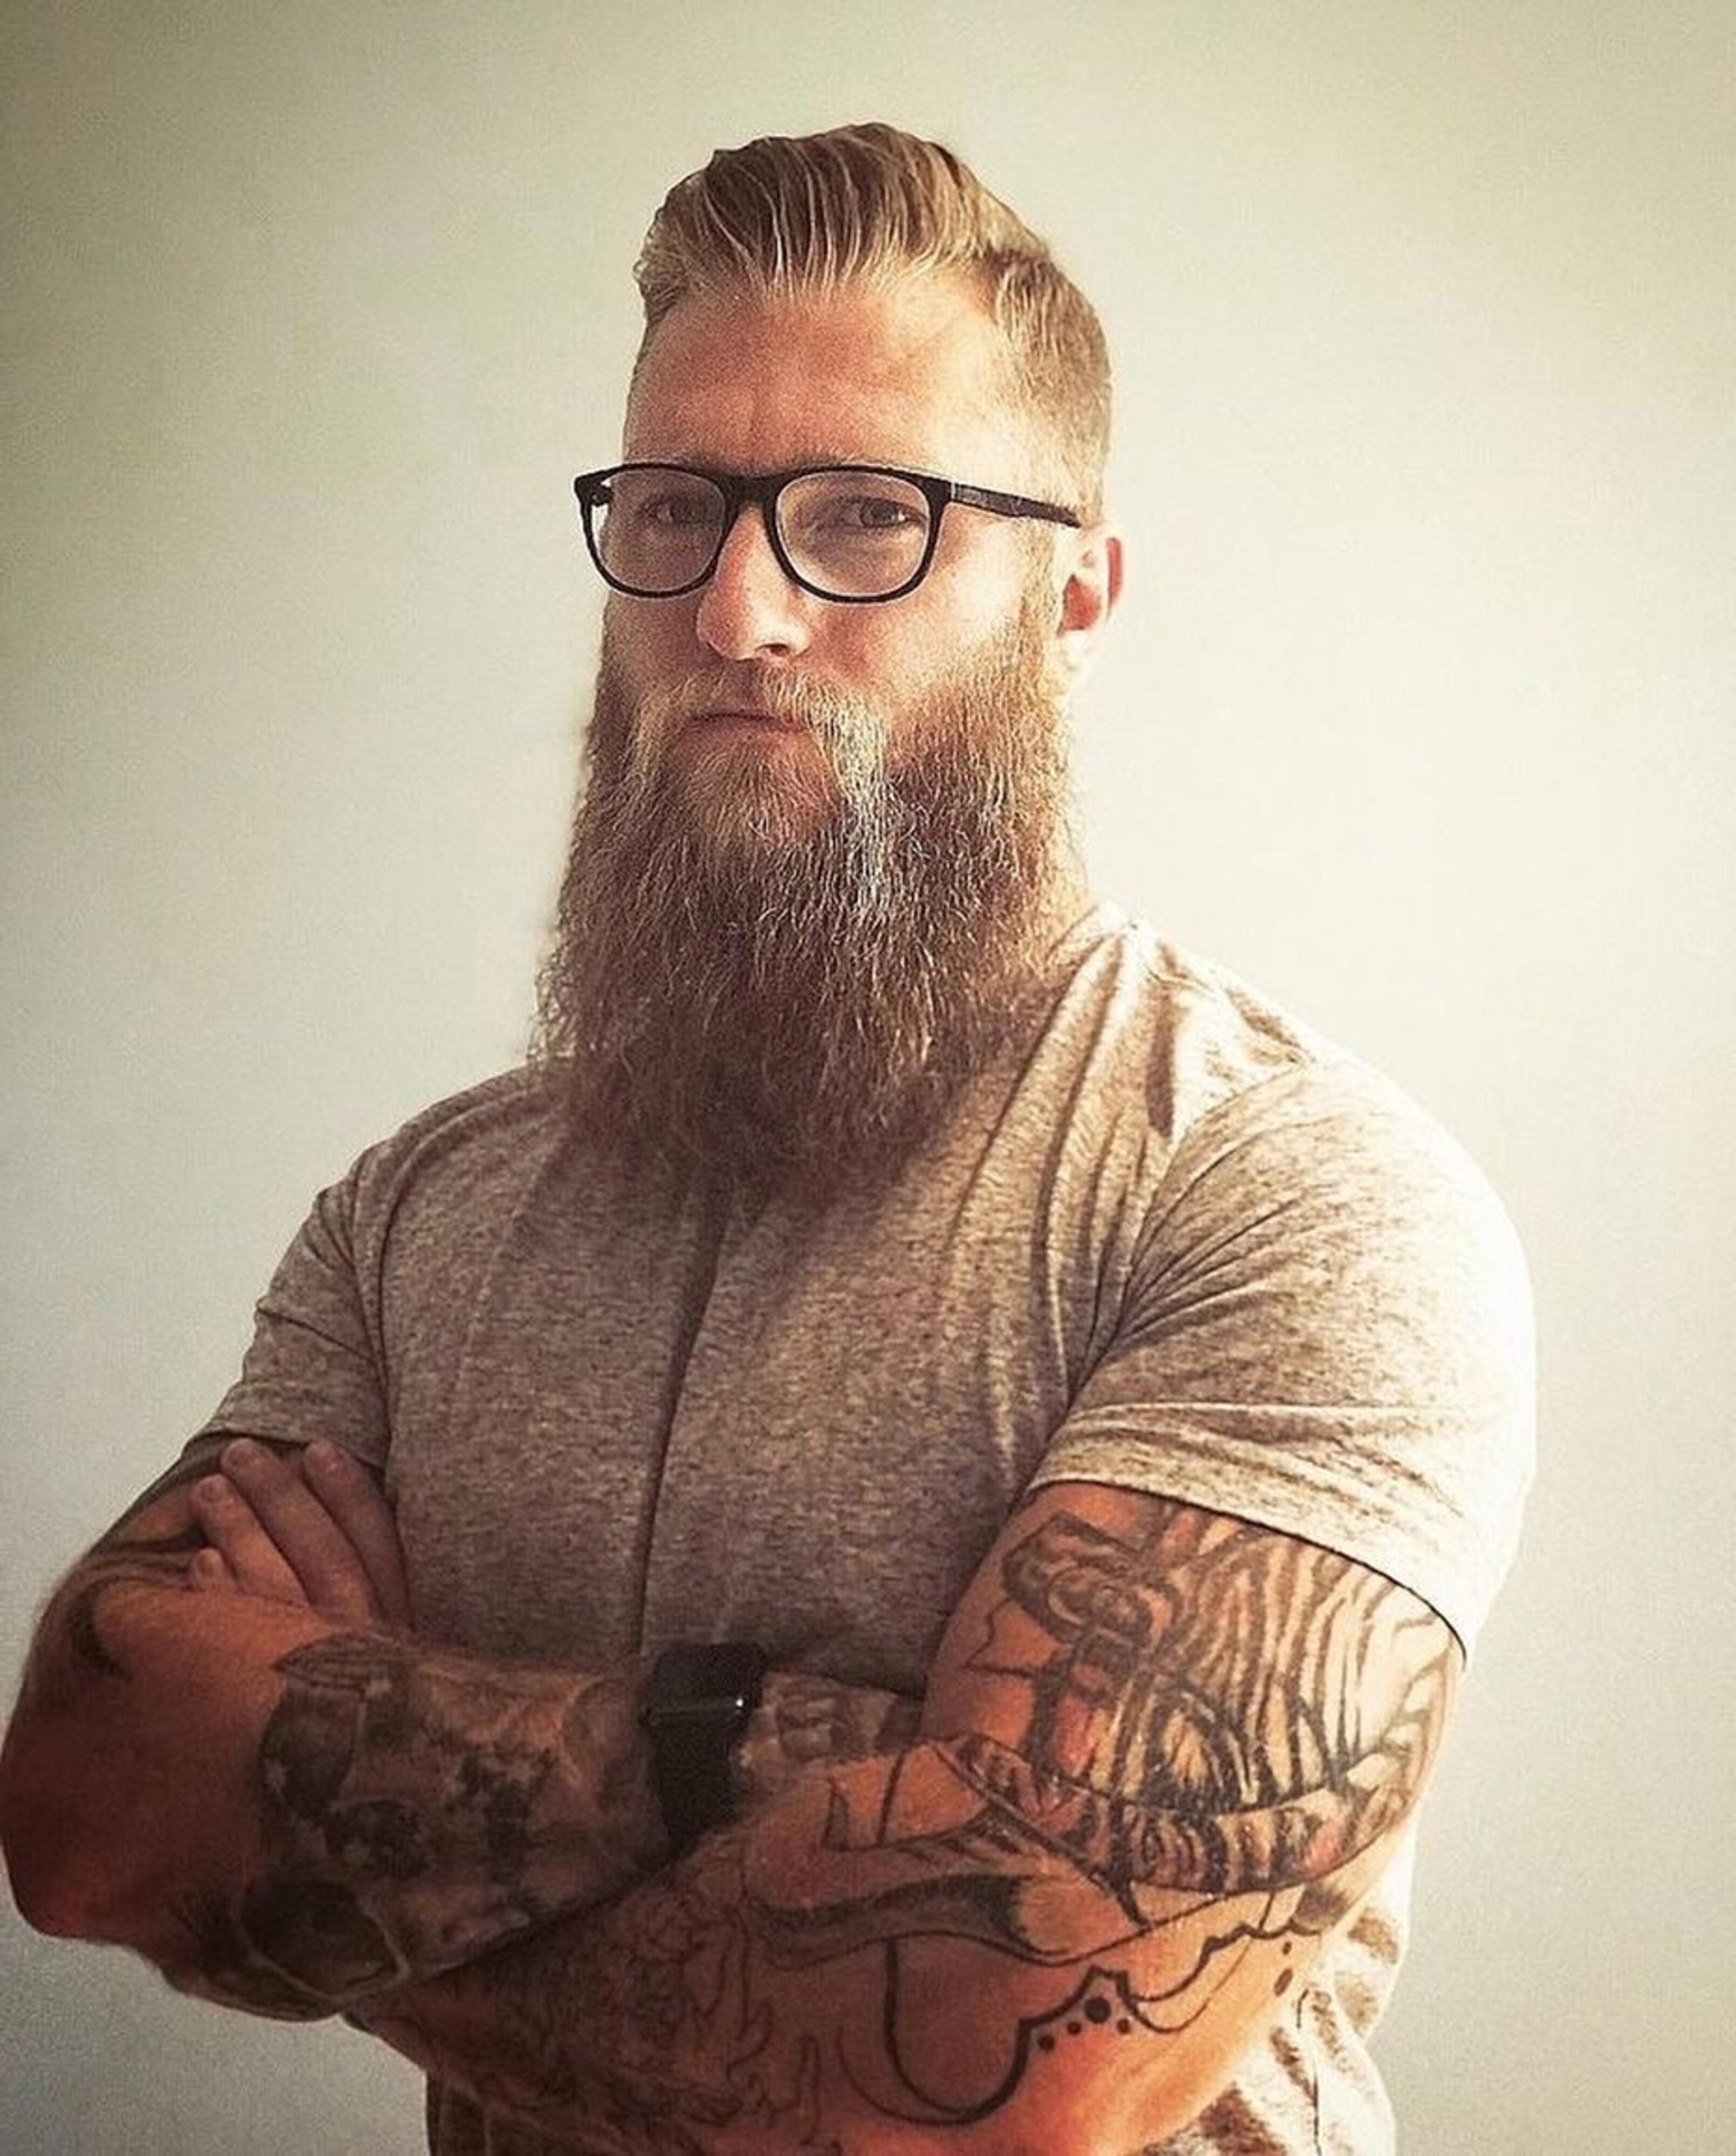 A long sparse beard for mature men.